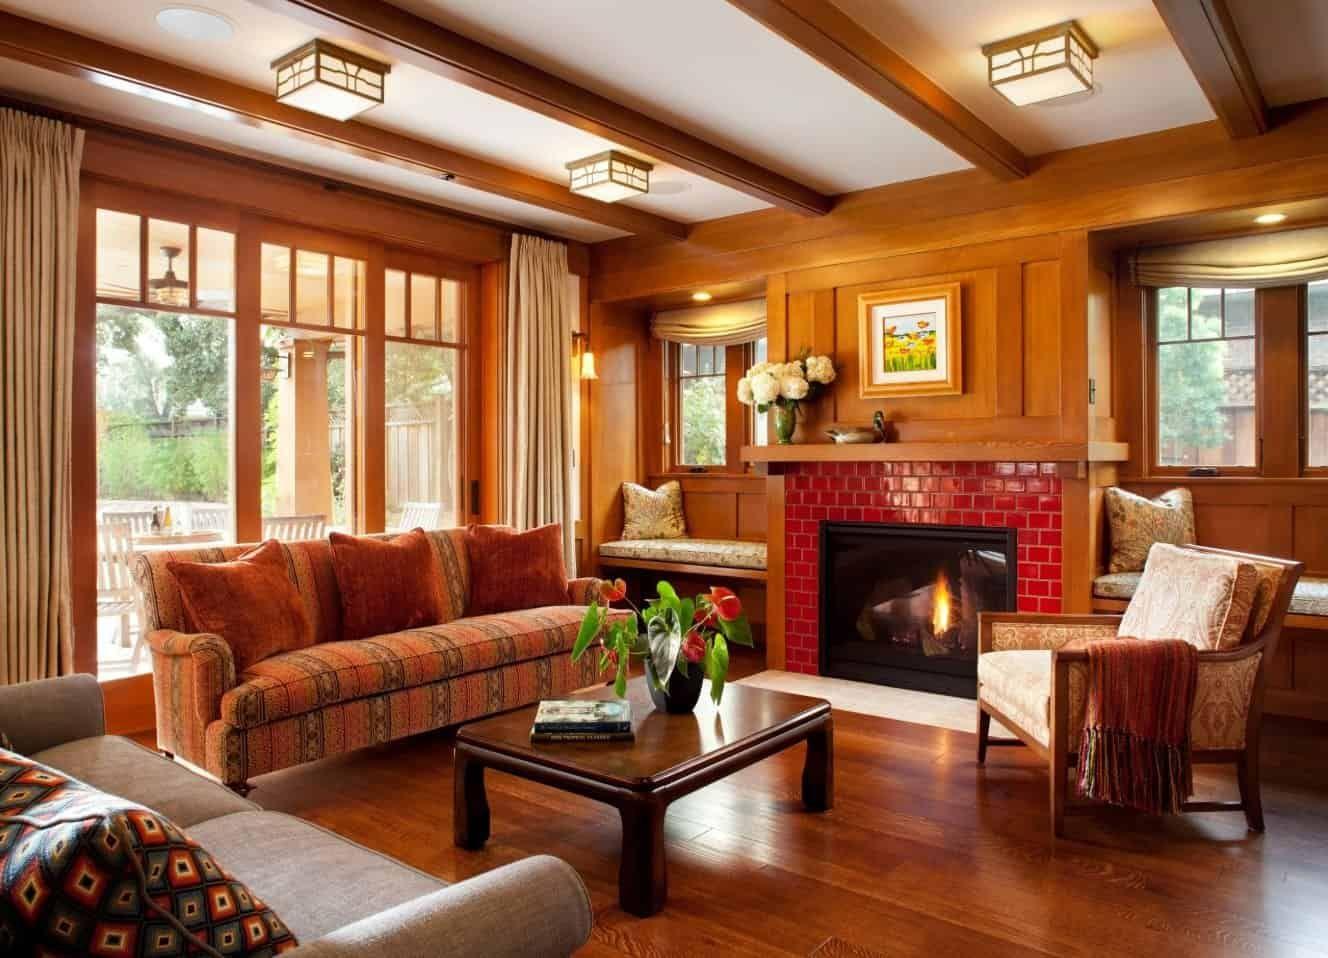 40 Craftsman-Style Living Room Ideas (Photos) | Craftsman ...